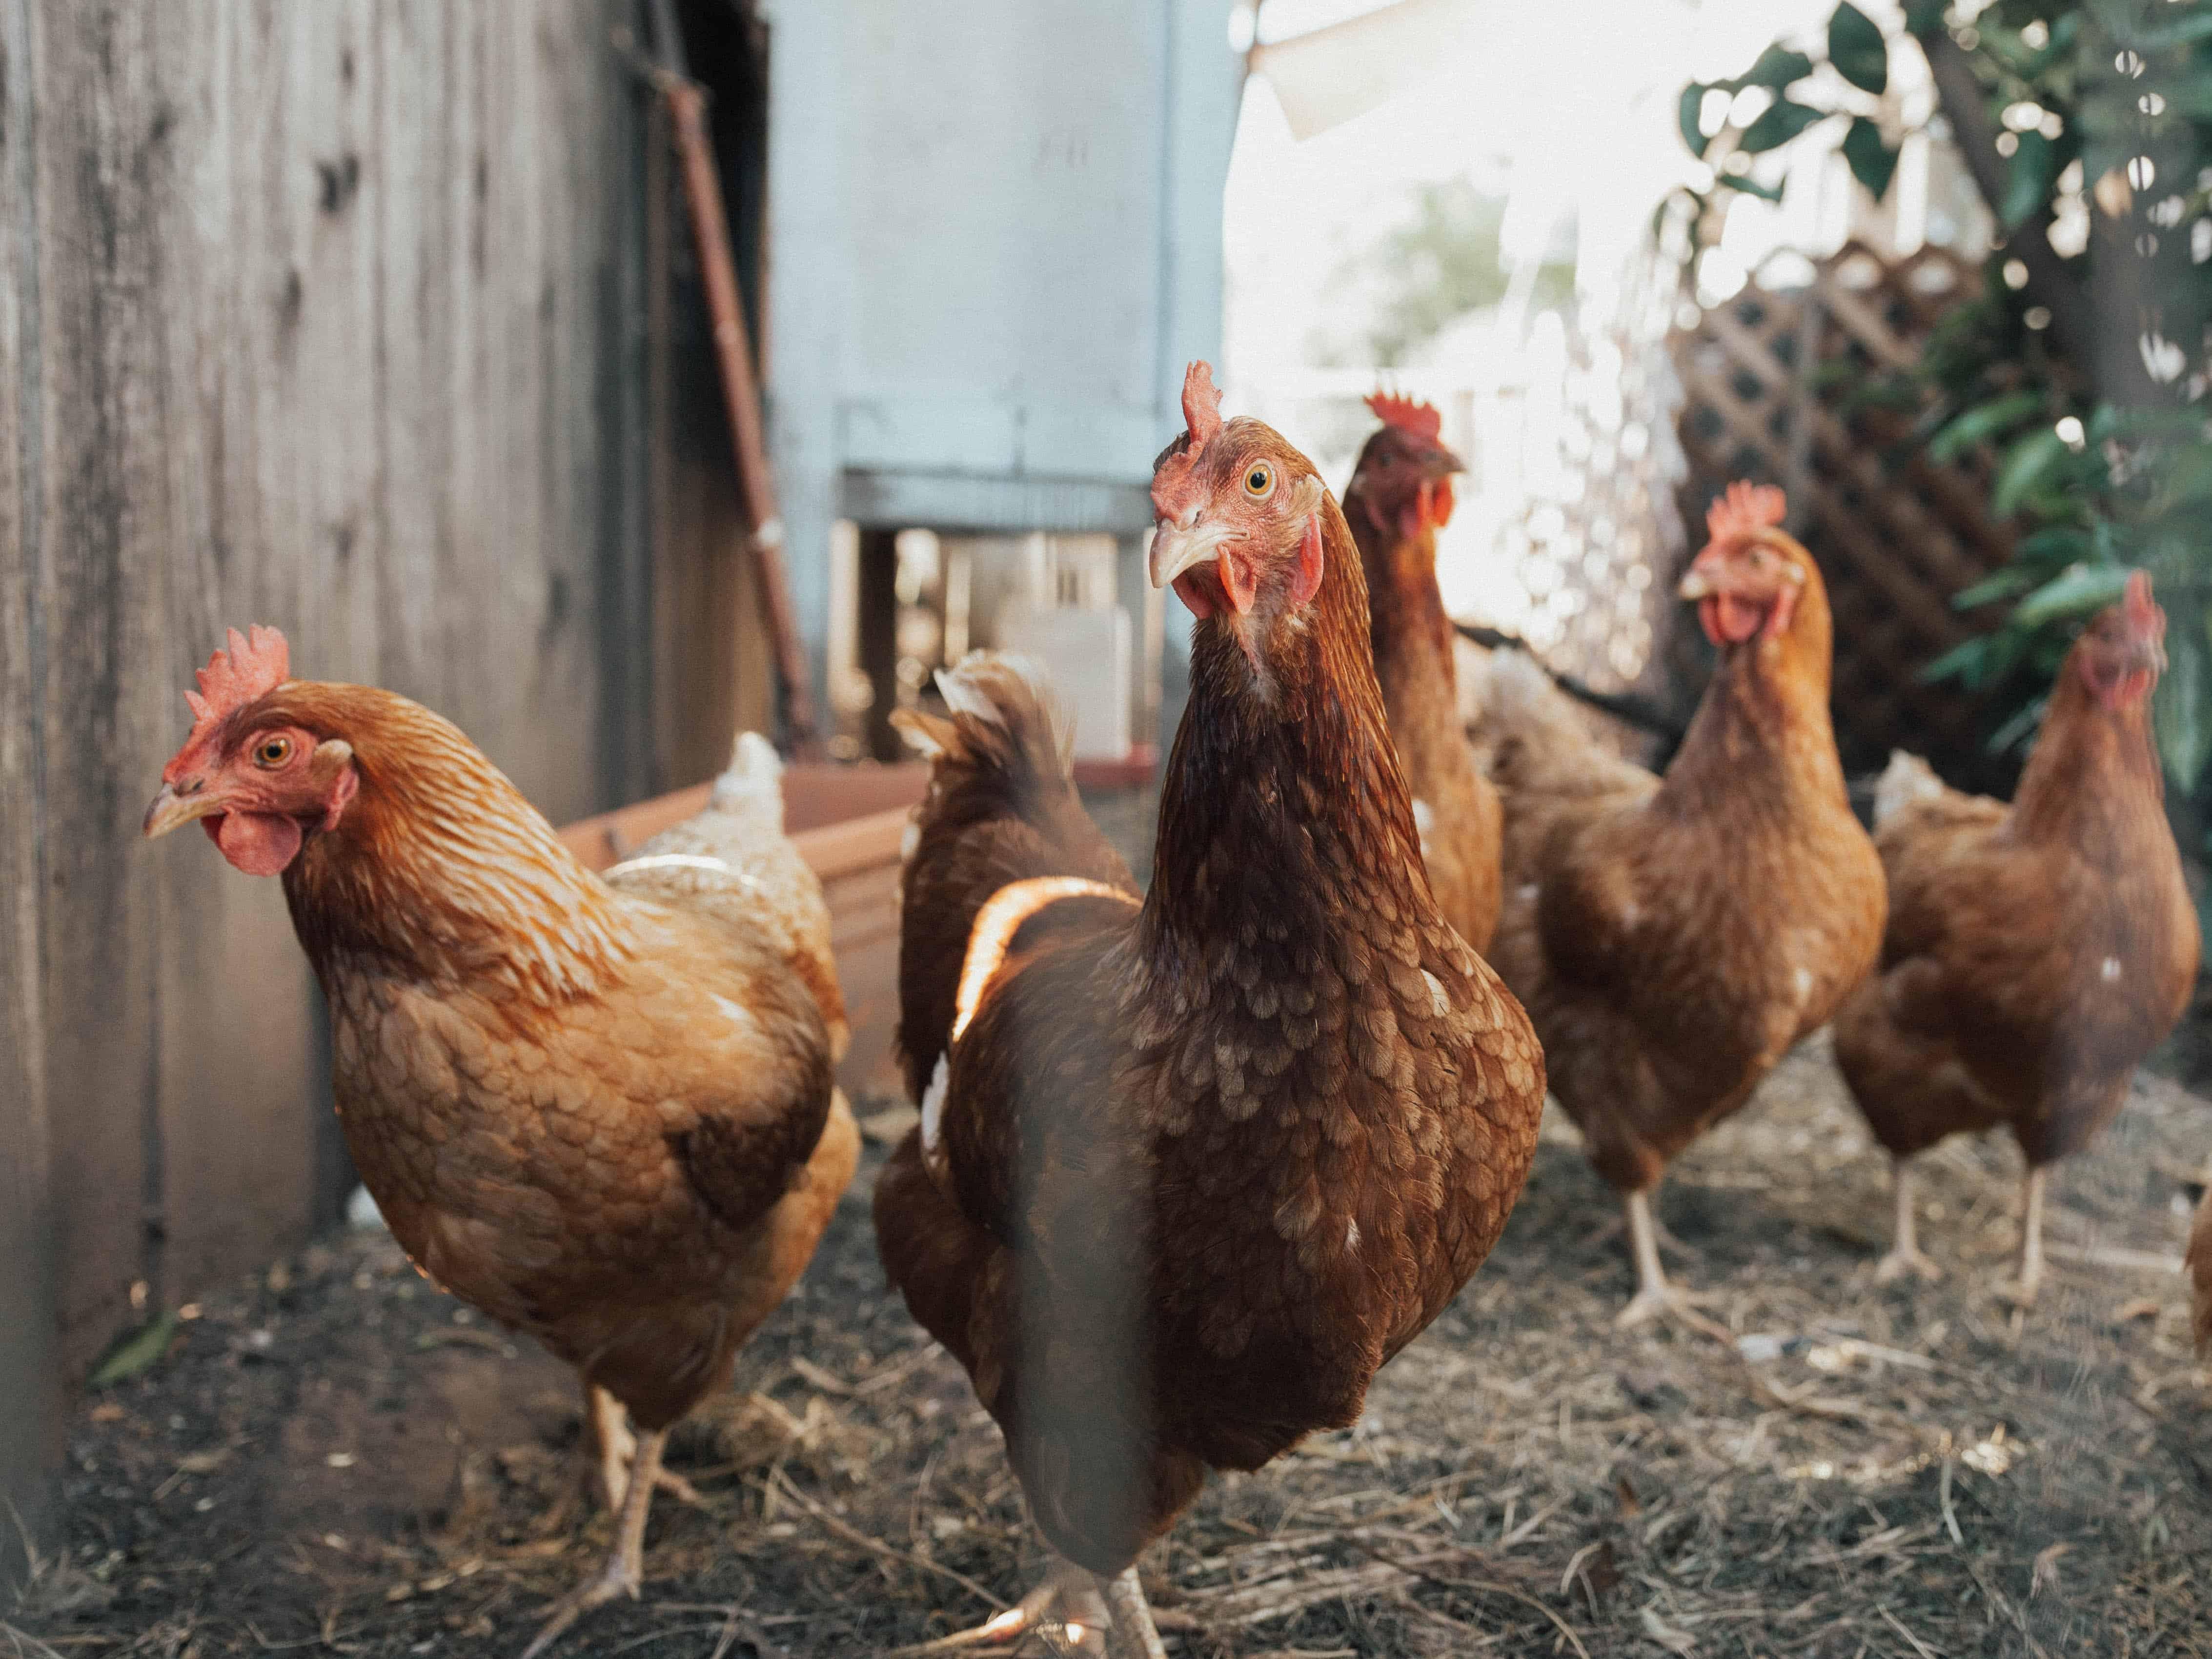 Hens, chicken facts